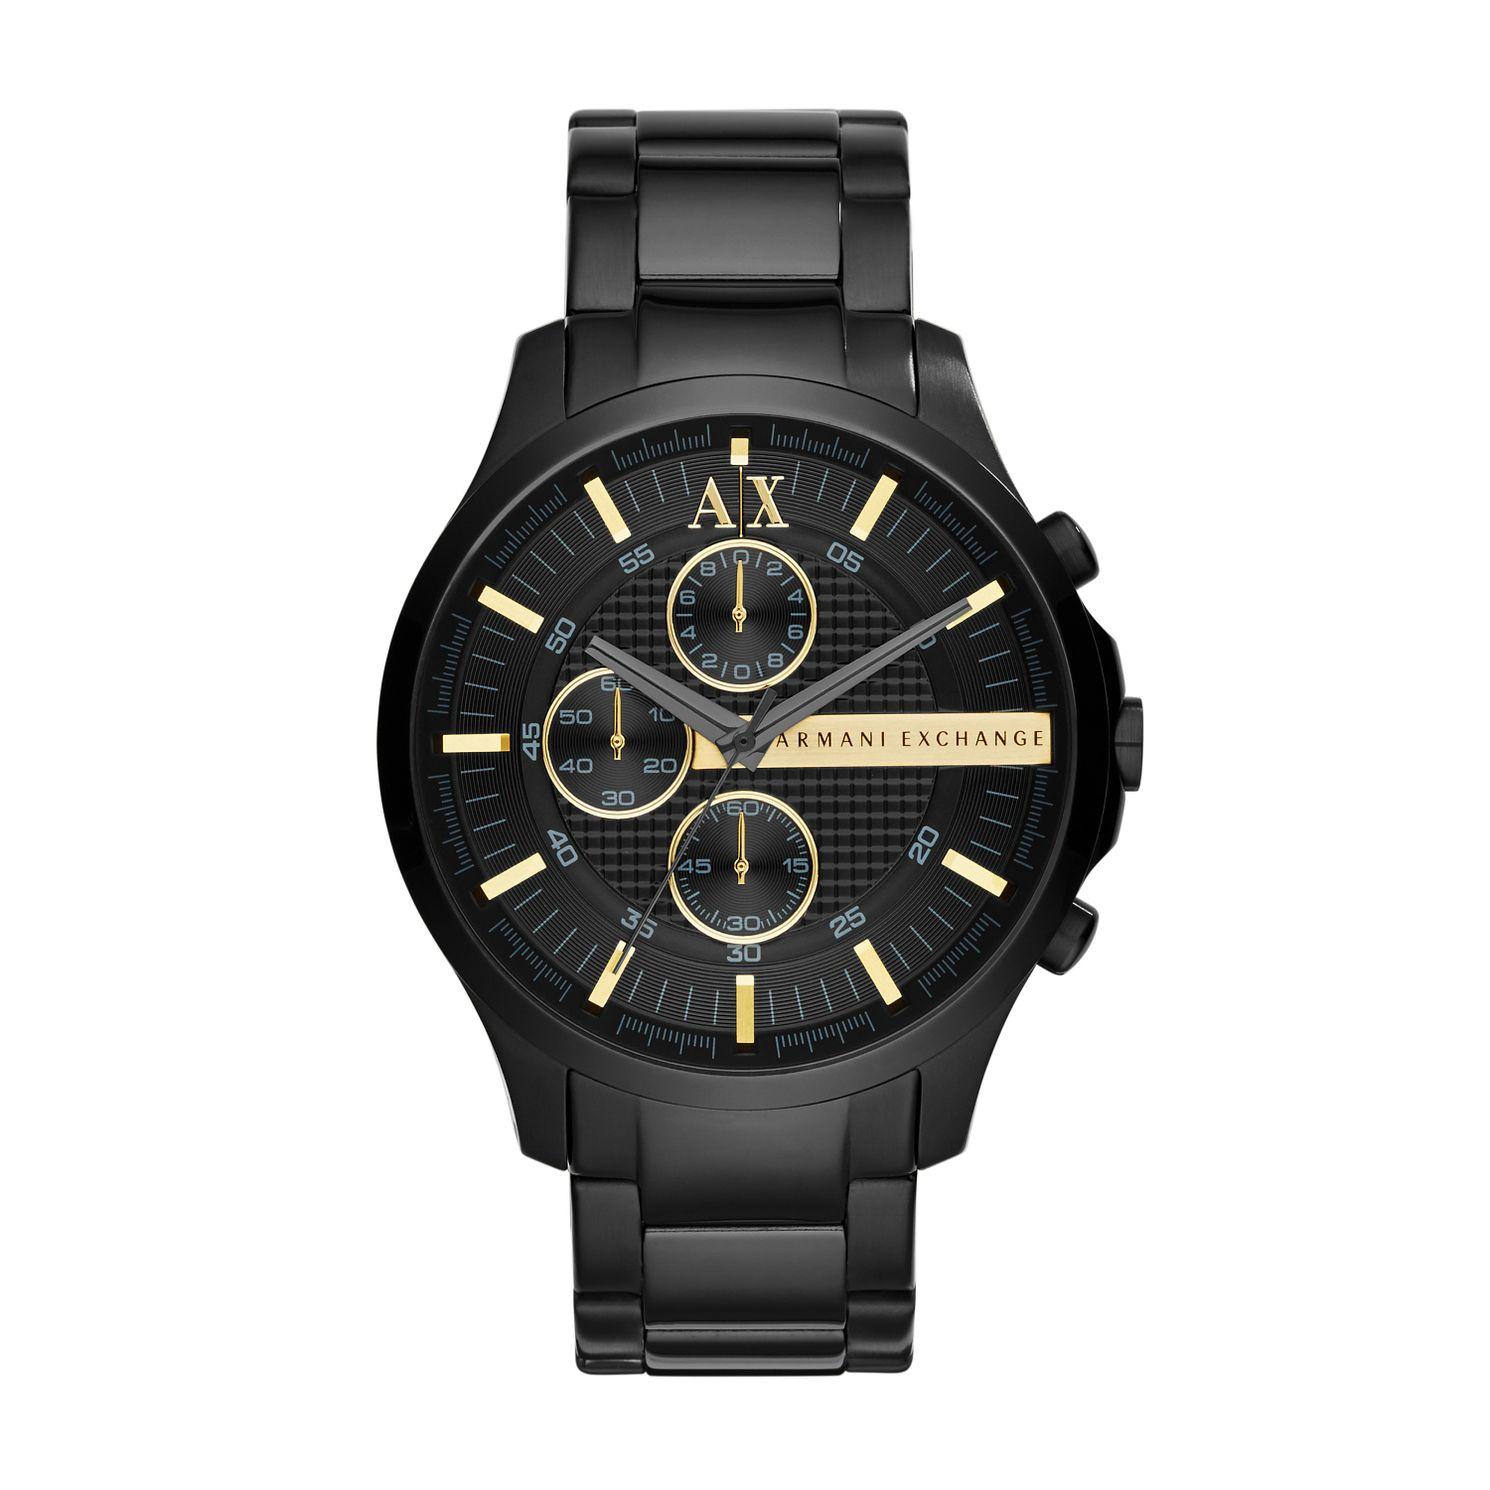 3a1b3688 Armani Exchange Men's Black Ion Plated Chronograph Watch